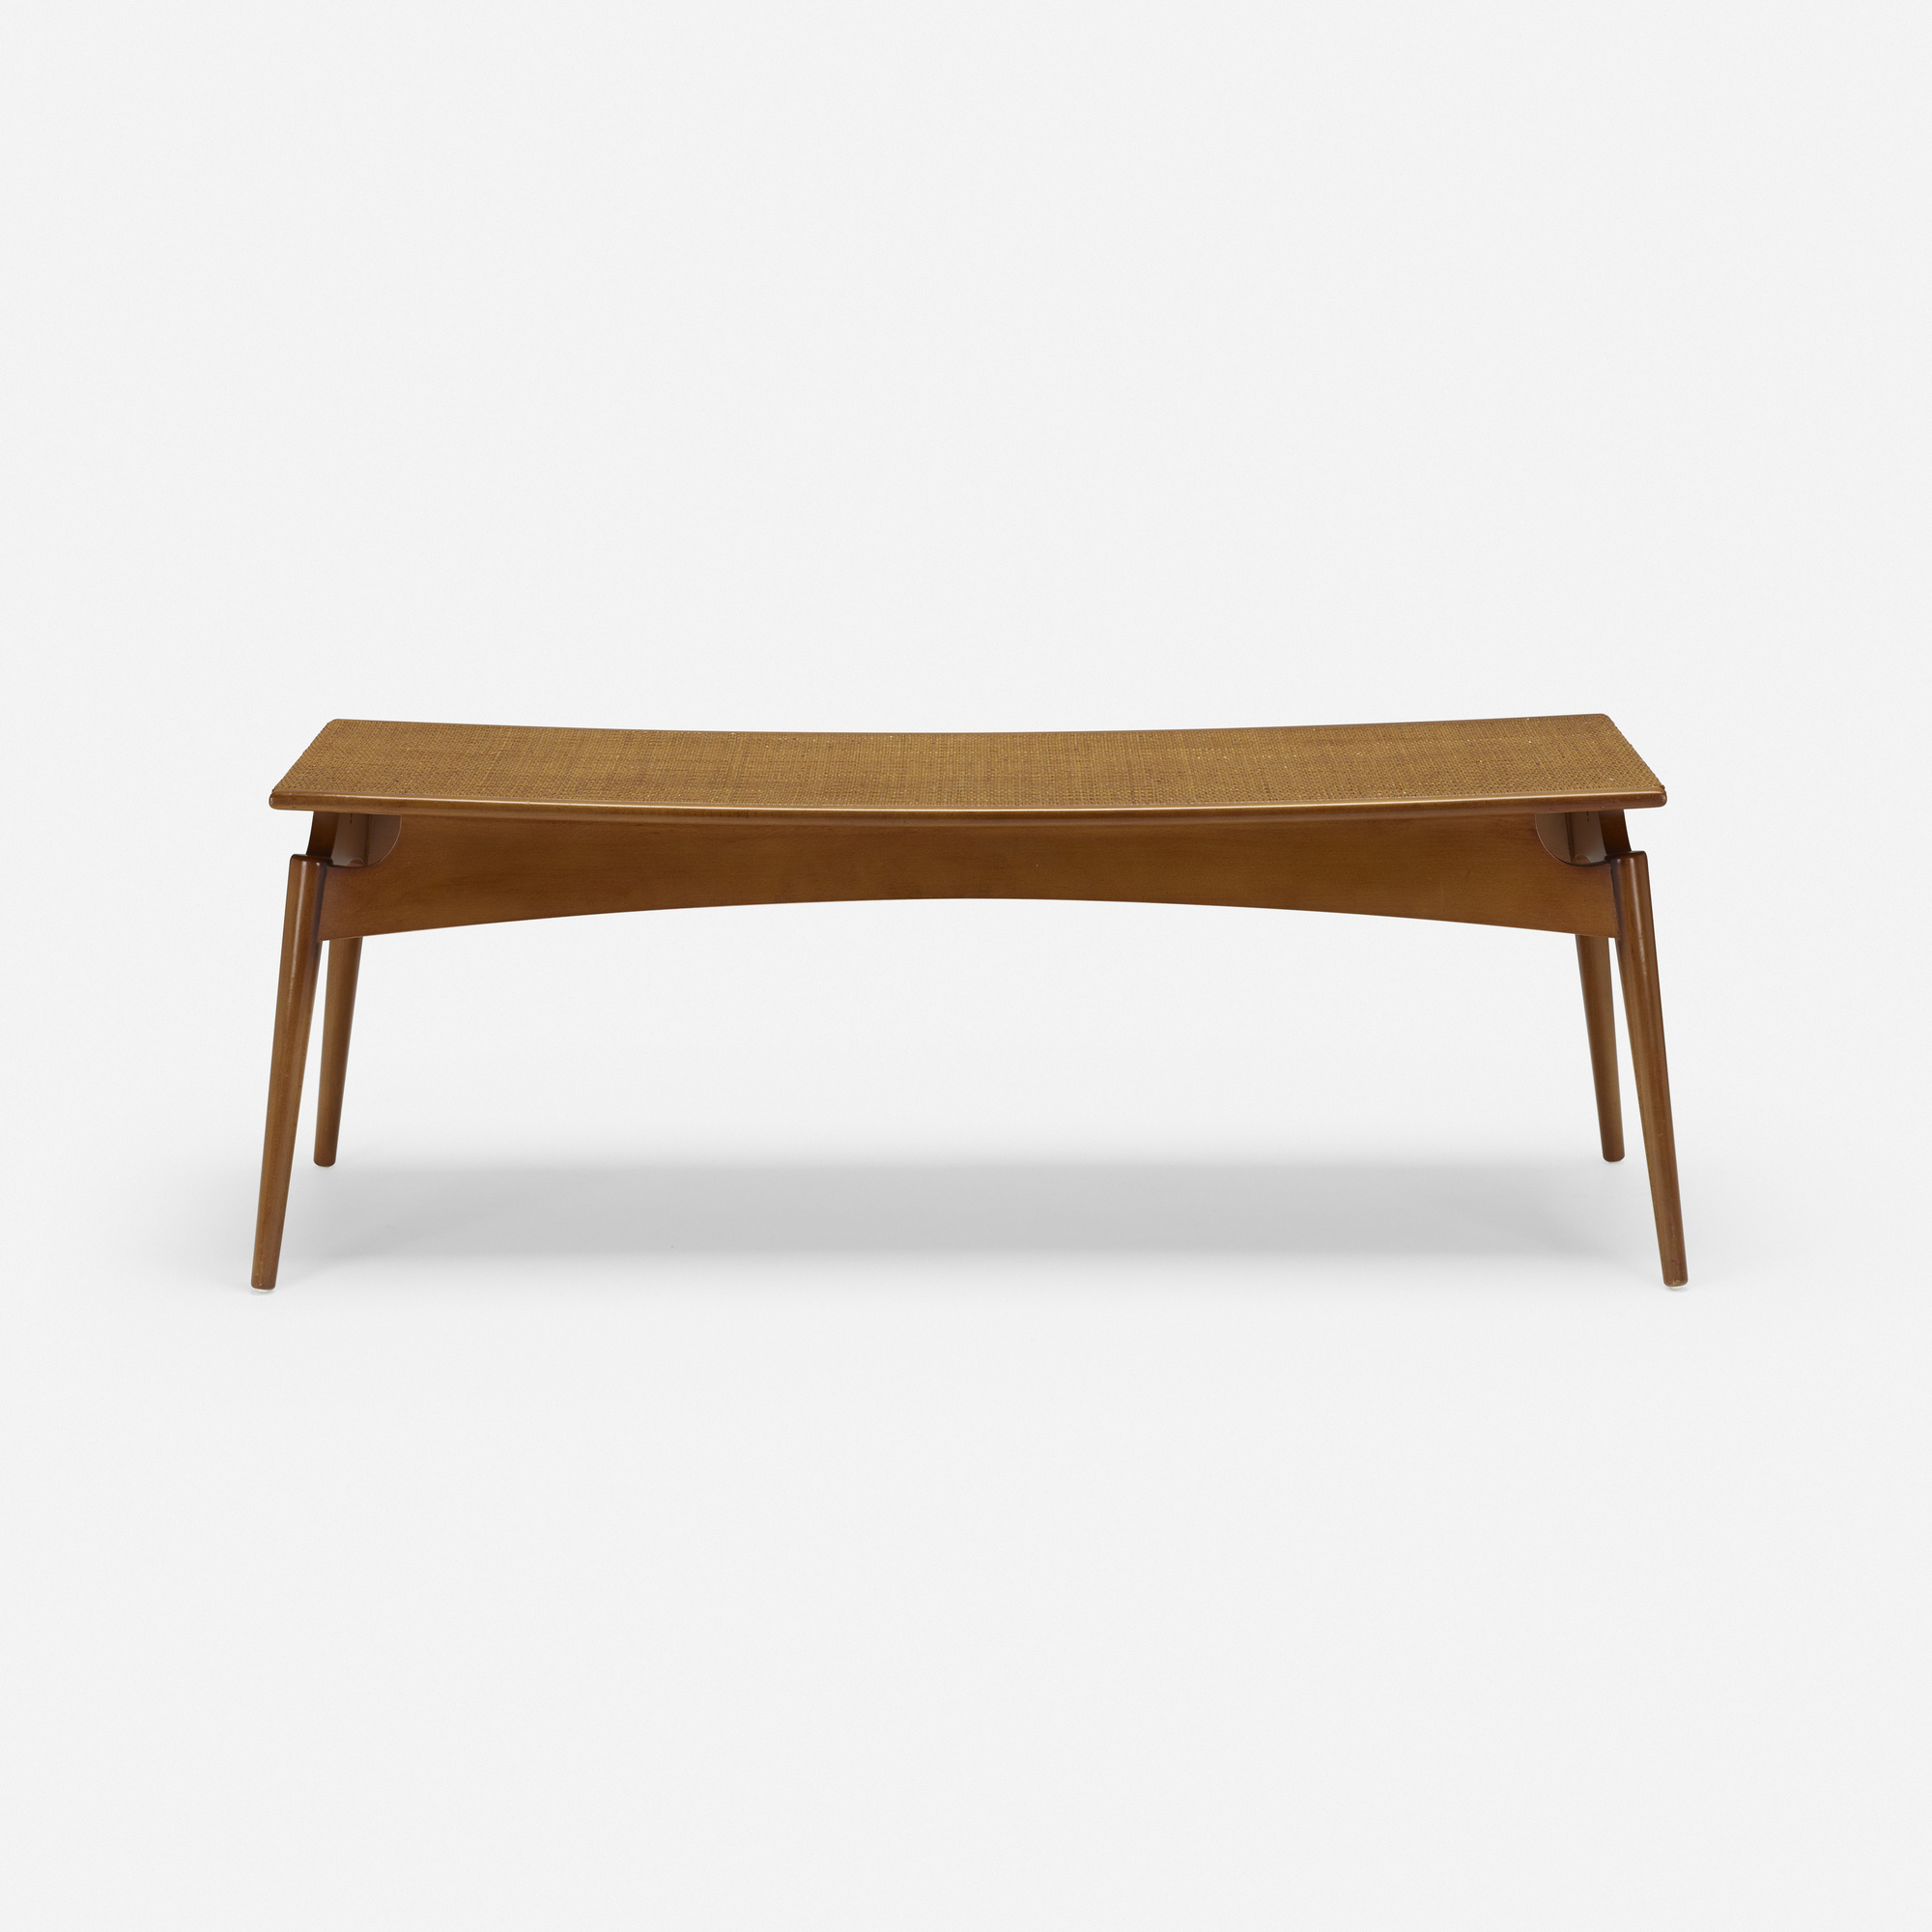 143: Baker / Copenhagen bench (2 of 3)